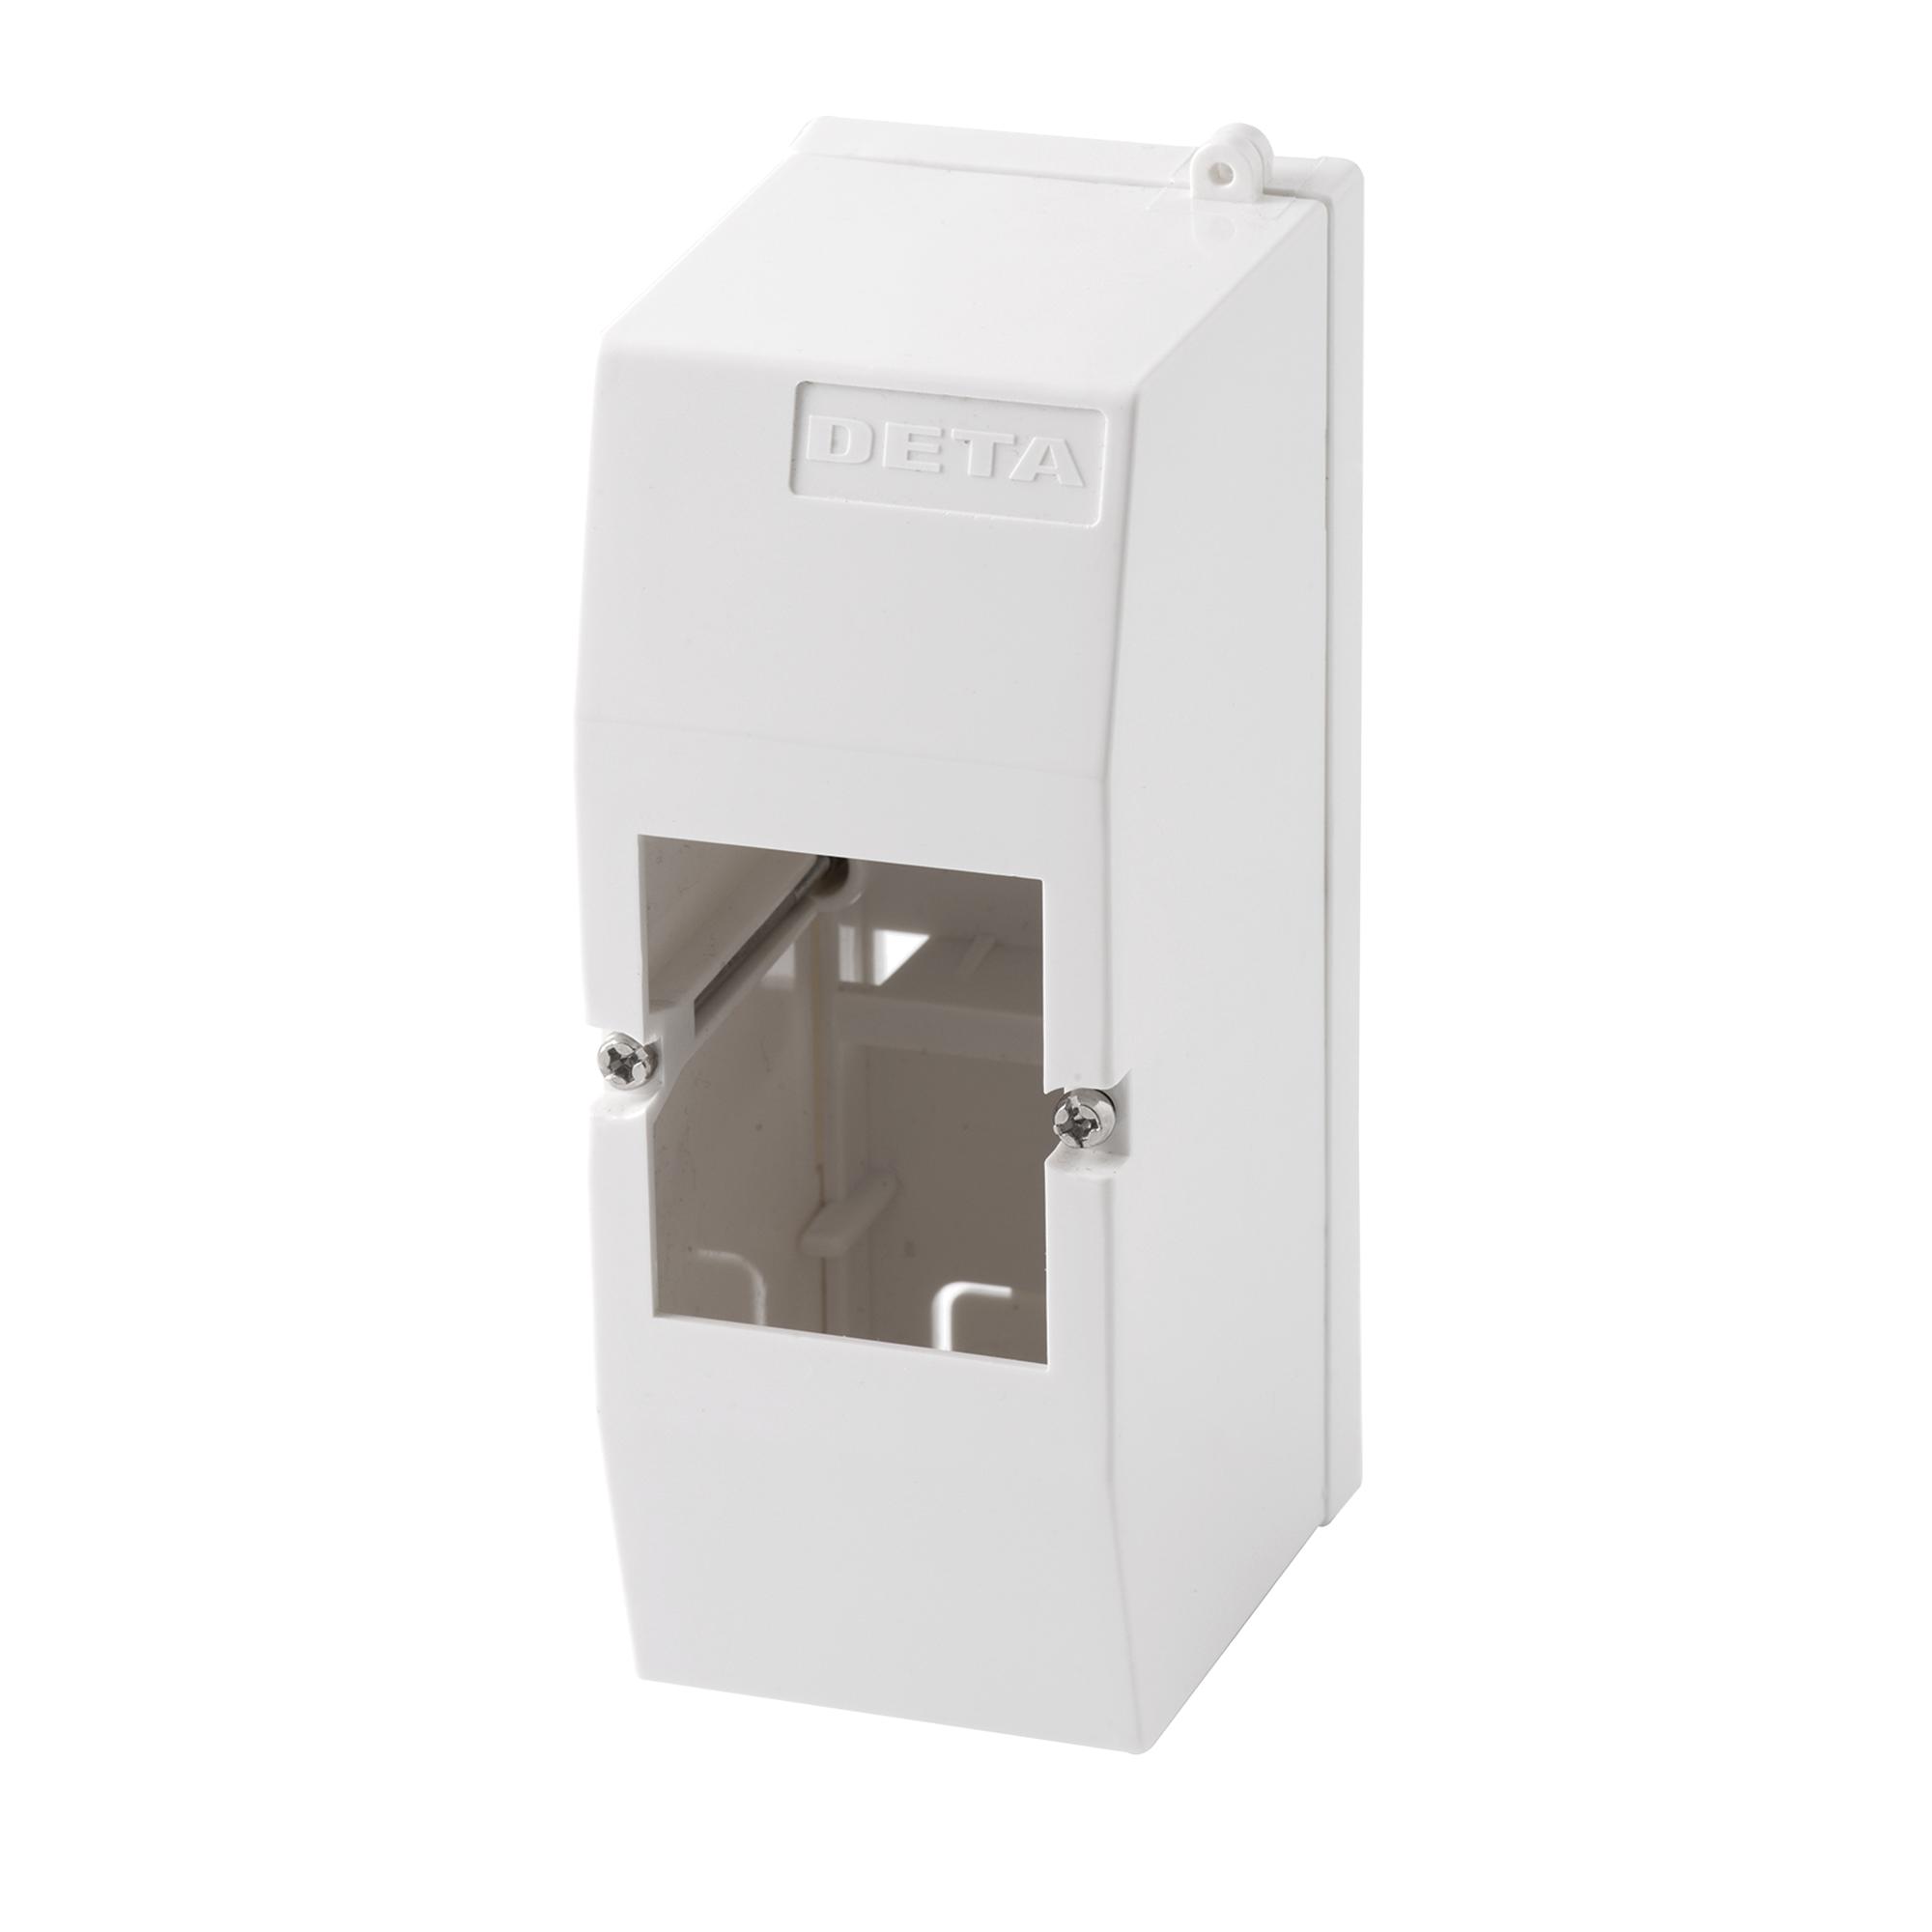 Deta 2 module enclosure